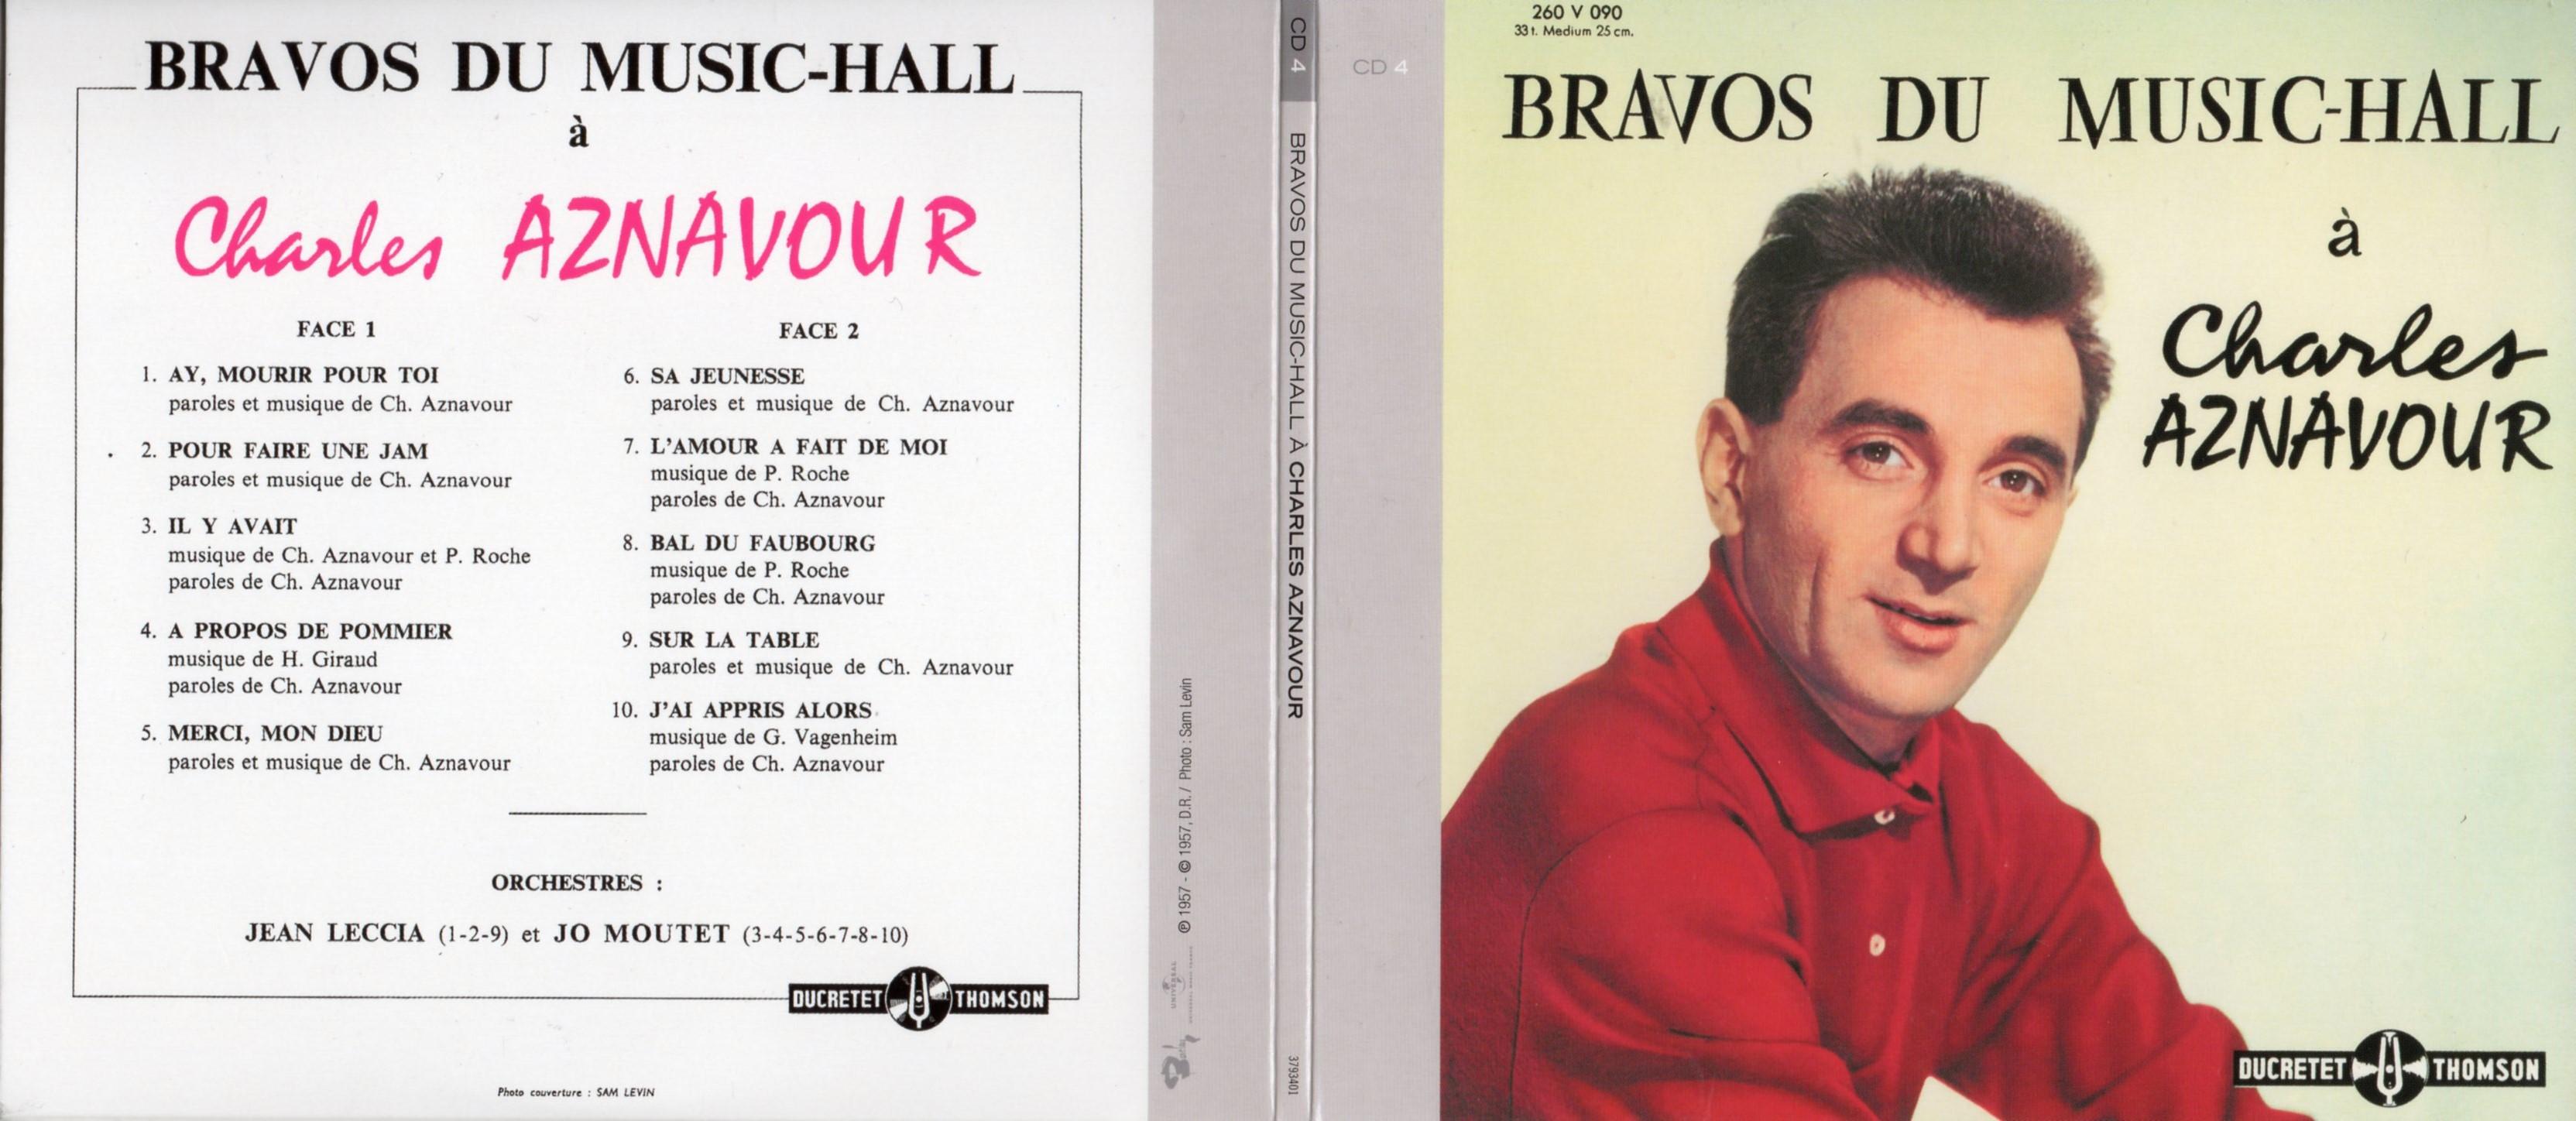 CHARLES AZNAVOUR - Bravos du Music-Hall (1957) Gatefold Card board REPLICA sleeve - CD